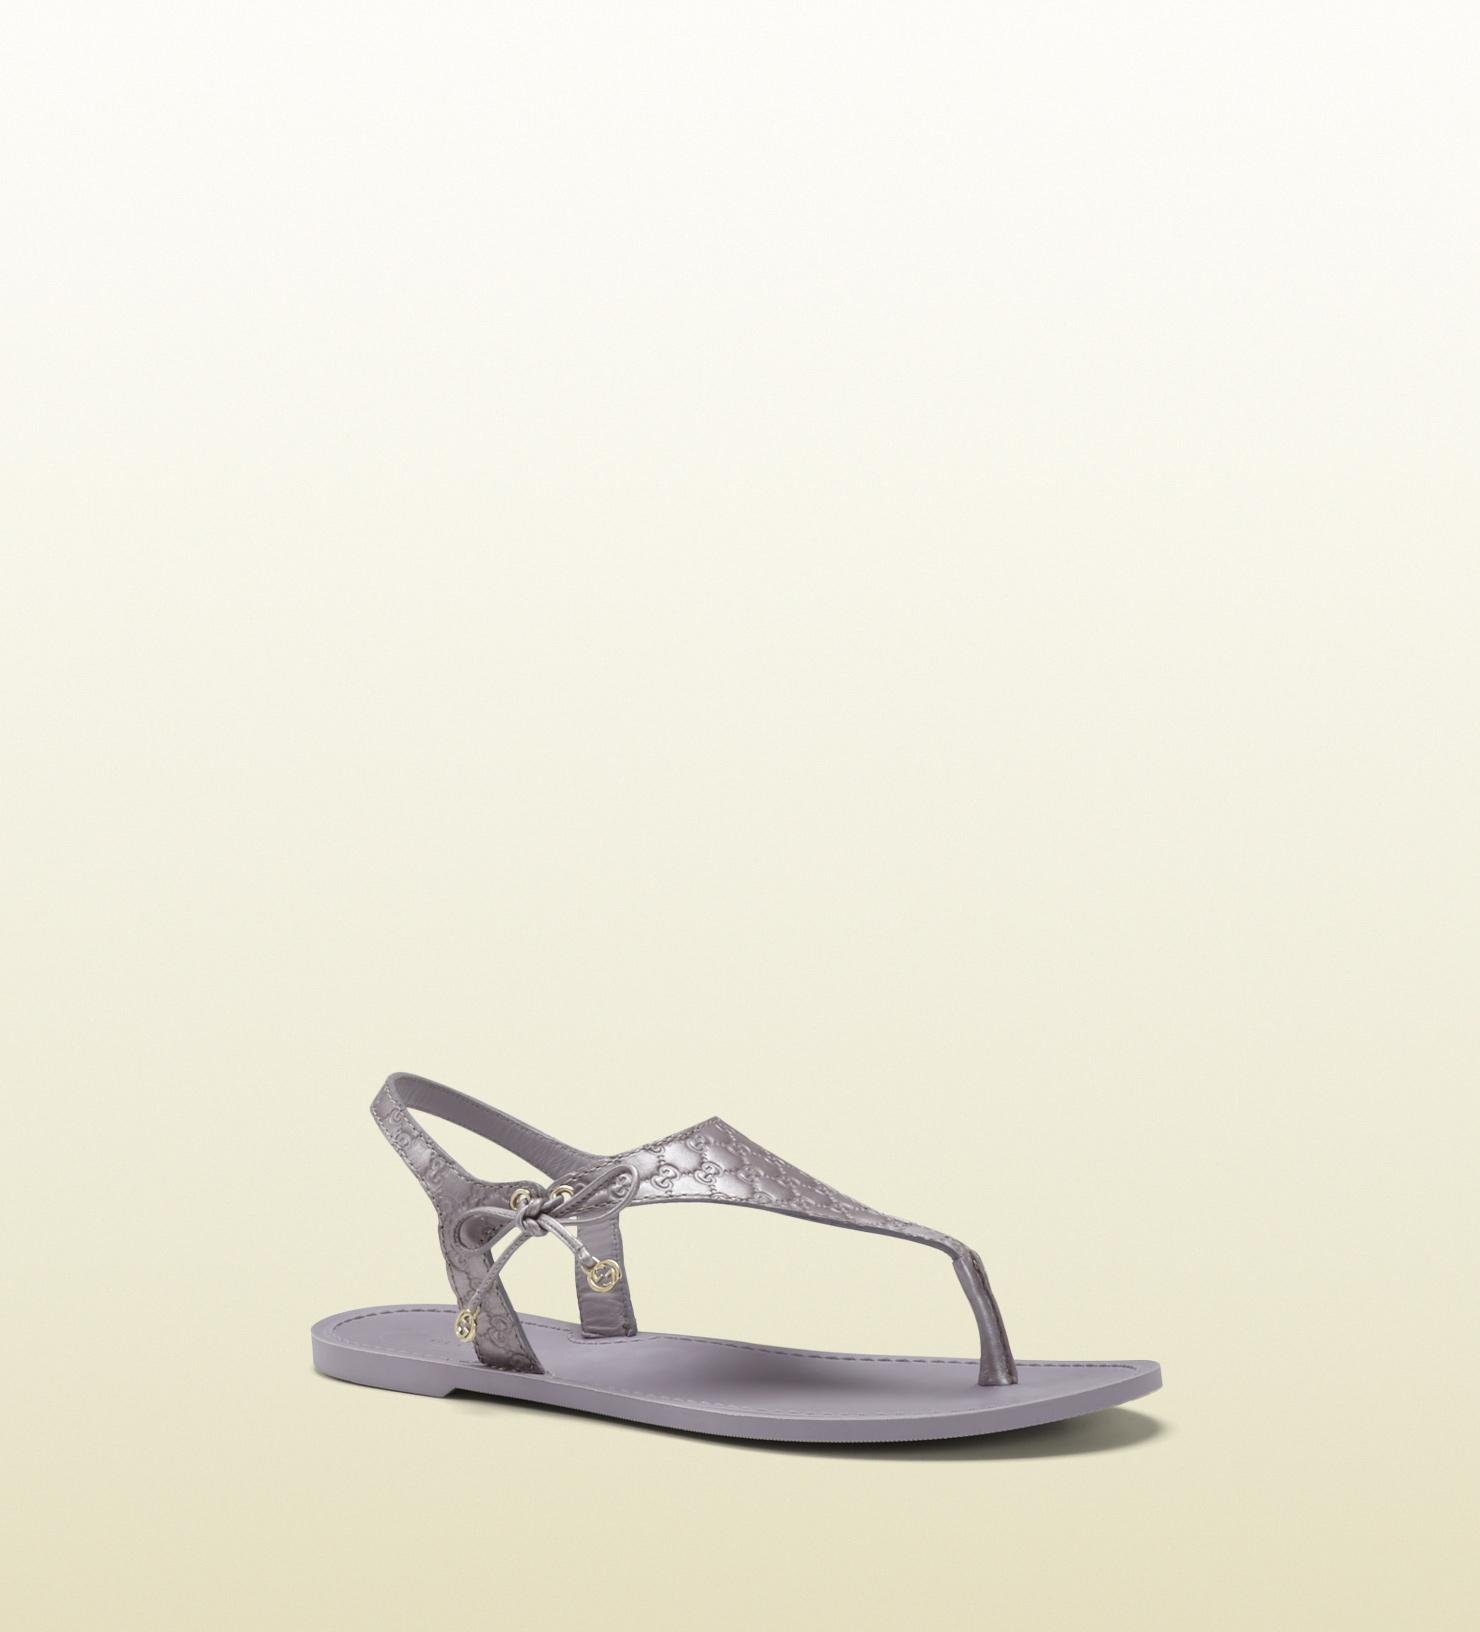 3c119ac80680 Lyst - Gucci Katina Lilac Metallic Leather Thong Sandal in Purple